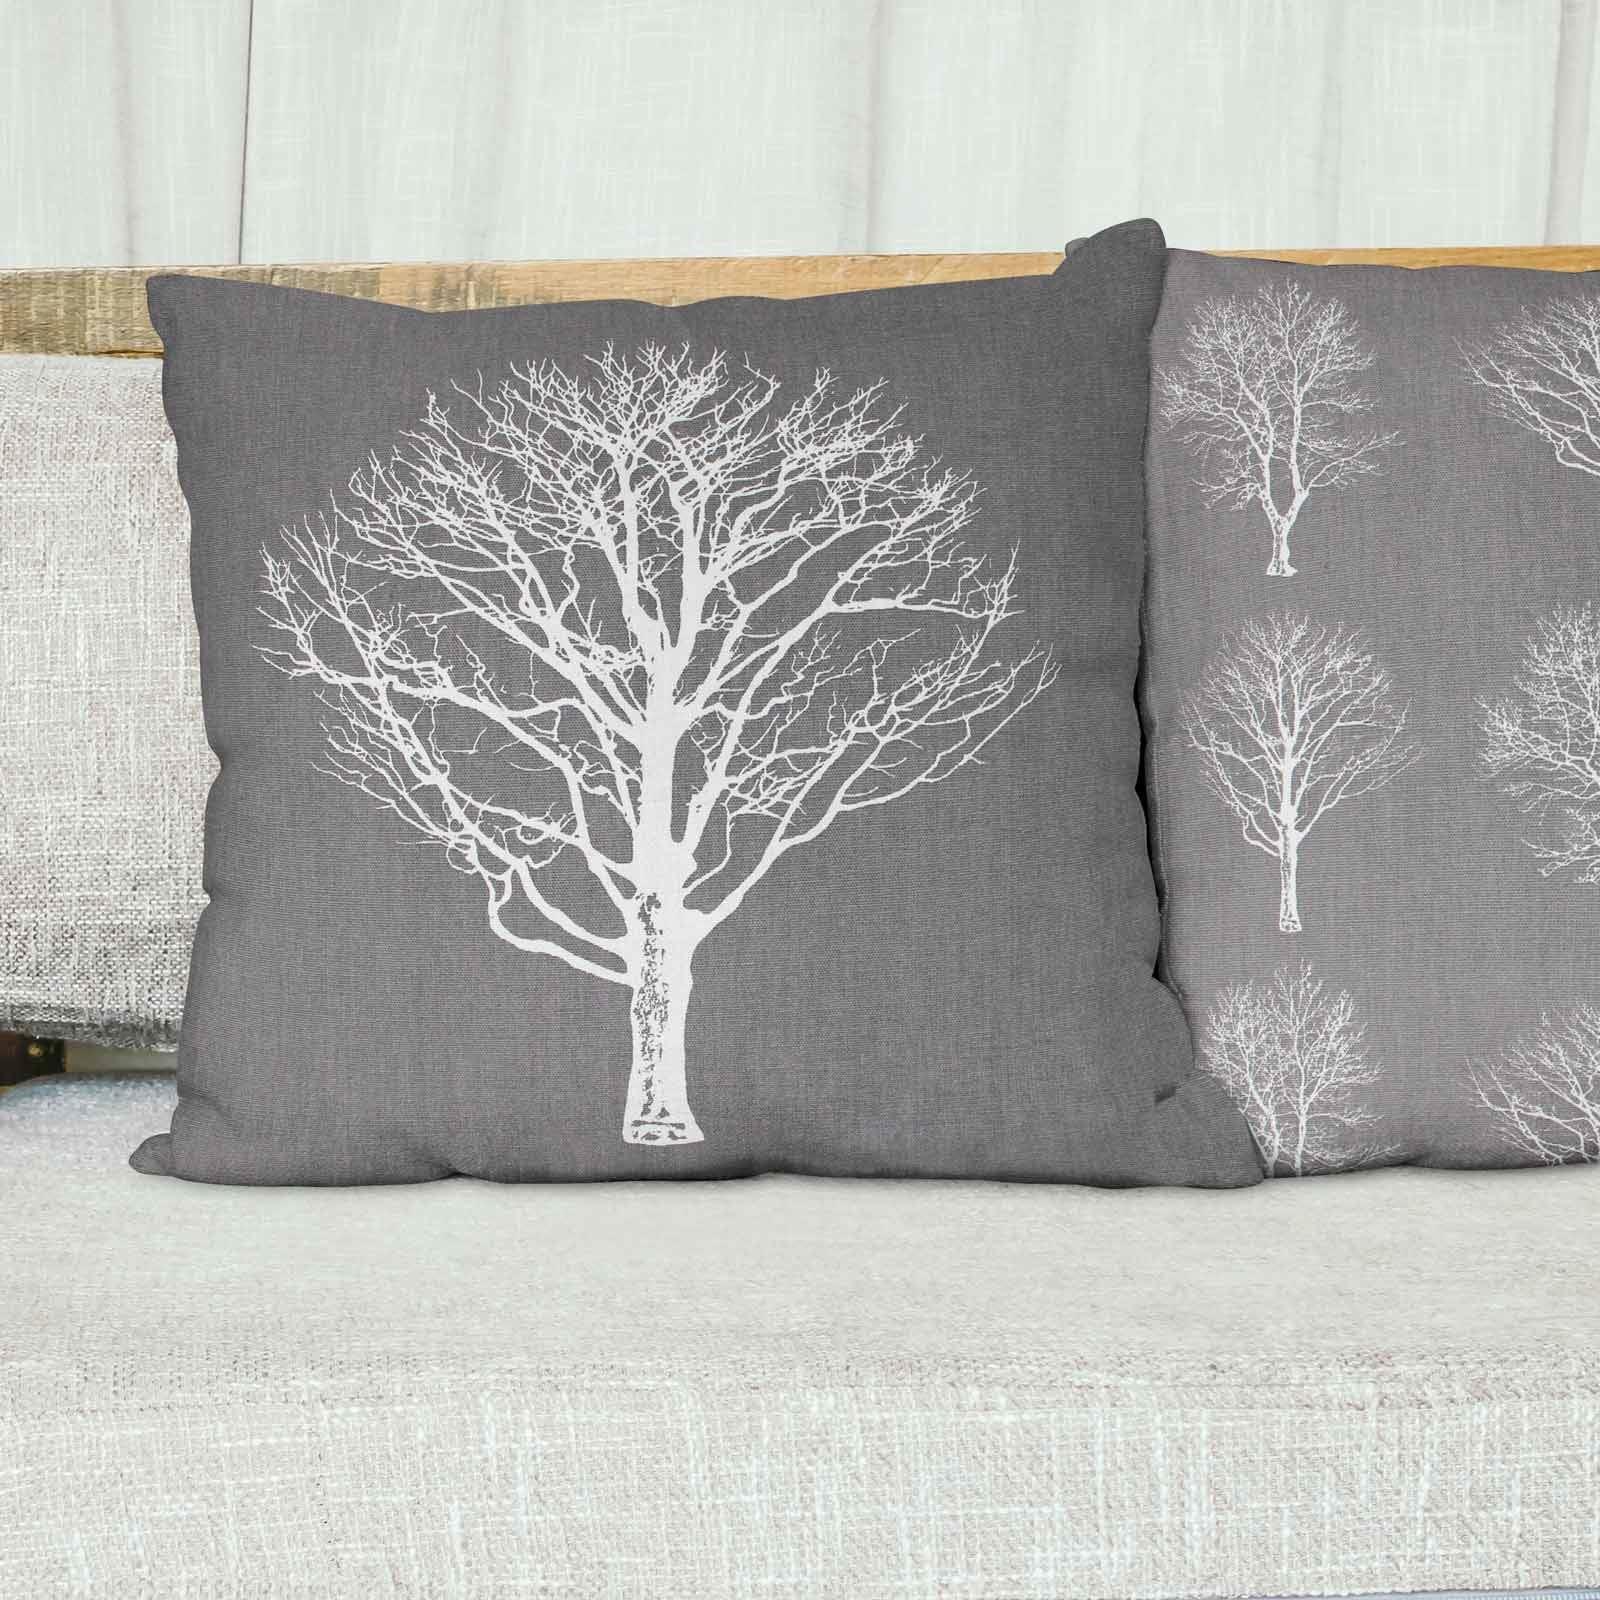 Woodland-Trees-Cushion-Cover-Modern-Reversible-Tree-Print-Covers-17-034-x-17-034 thumbnail 8